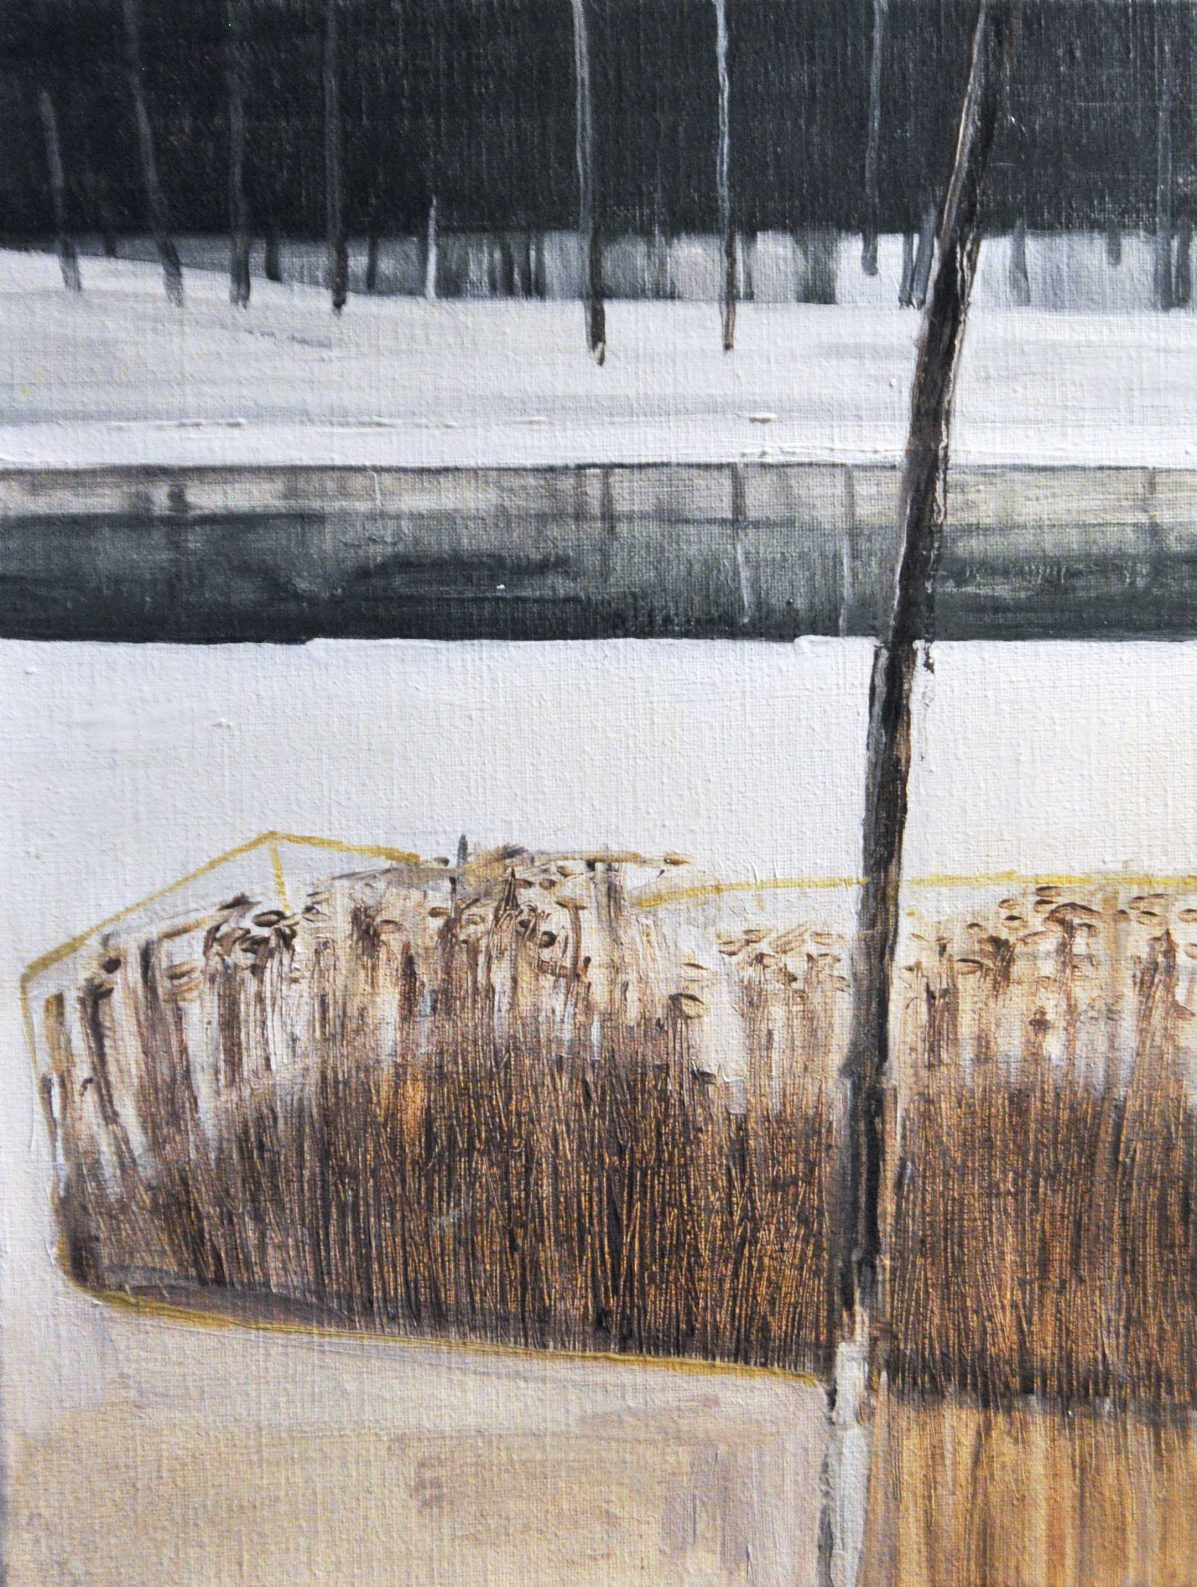 Riverside winter 3 (a), 2016. Oil, canvas. 40 x 30 cm